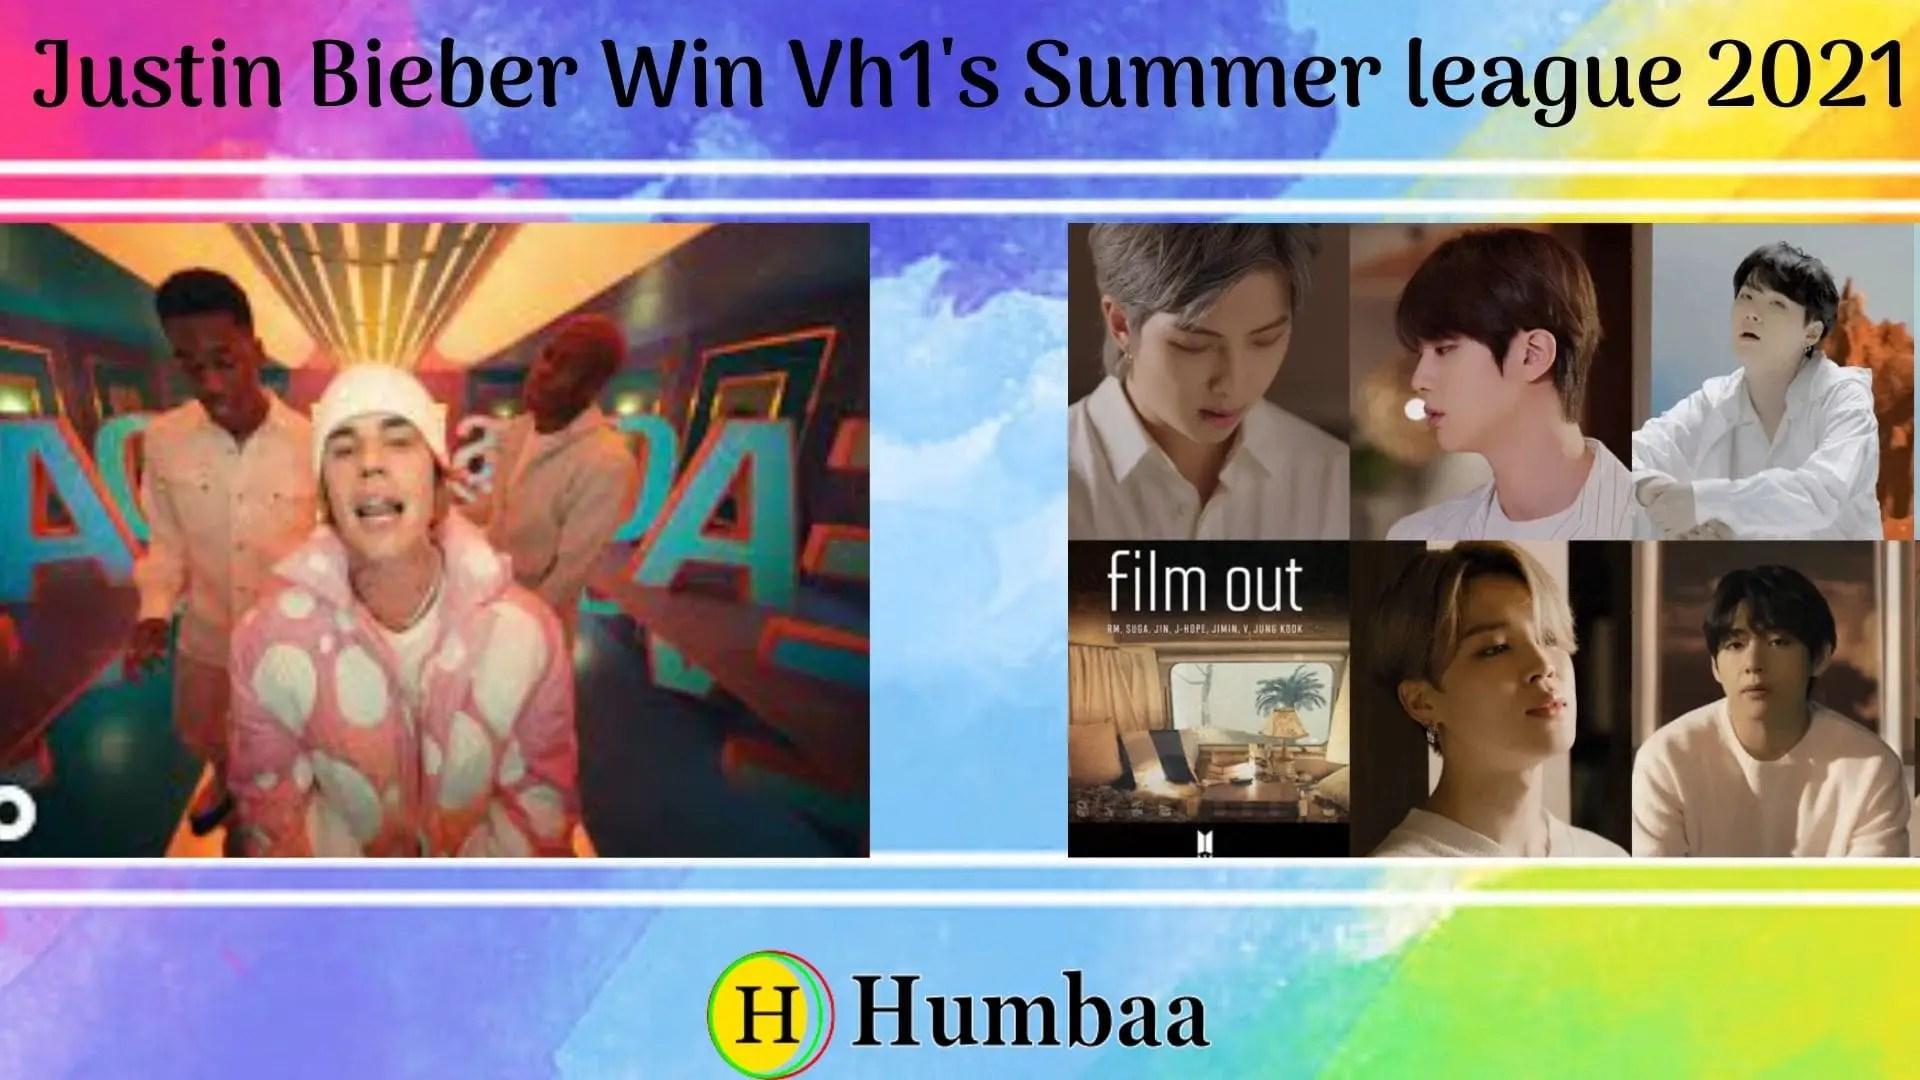 Justin Bieber Win Vh1's Summer league 2021 Humbaa